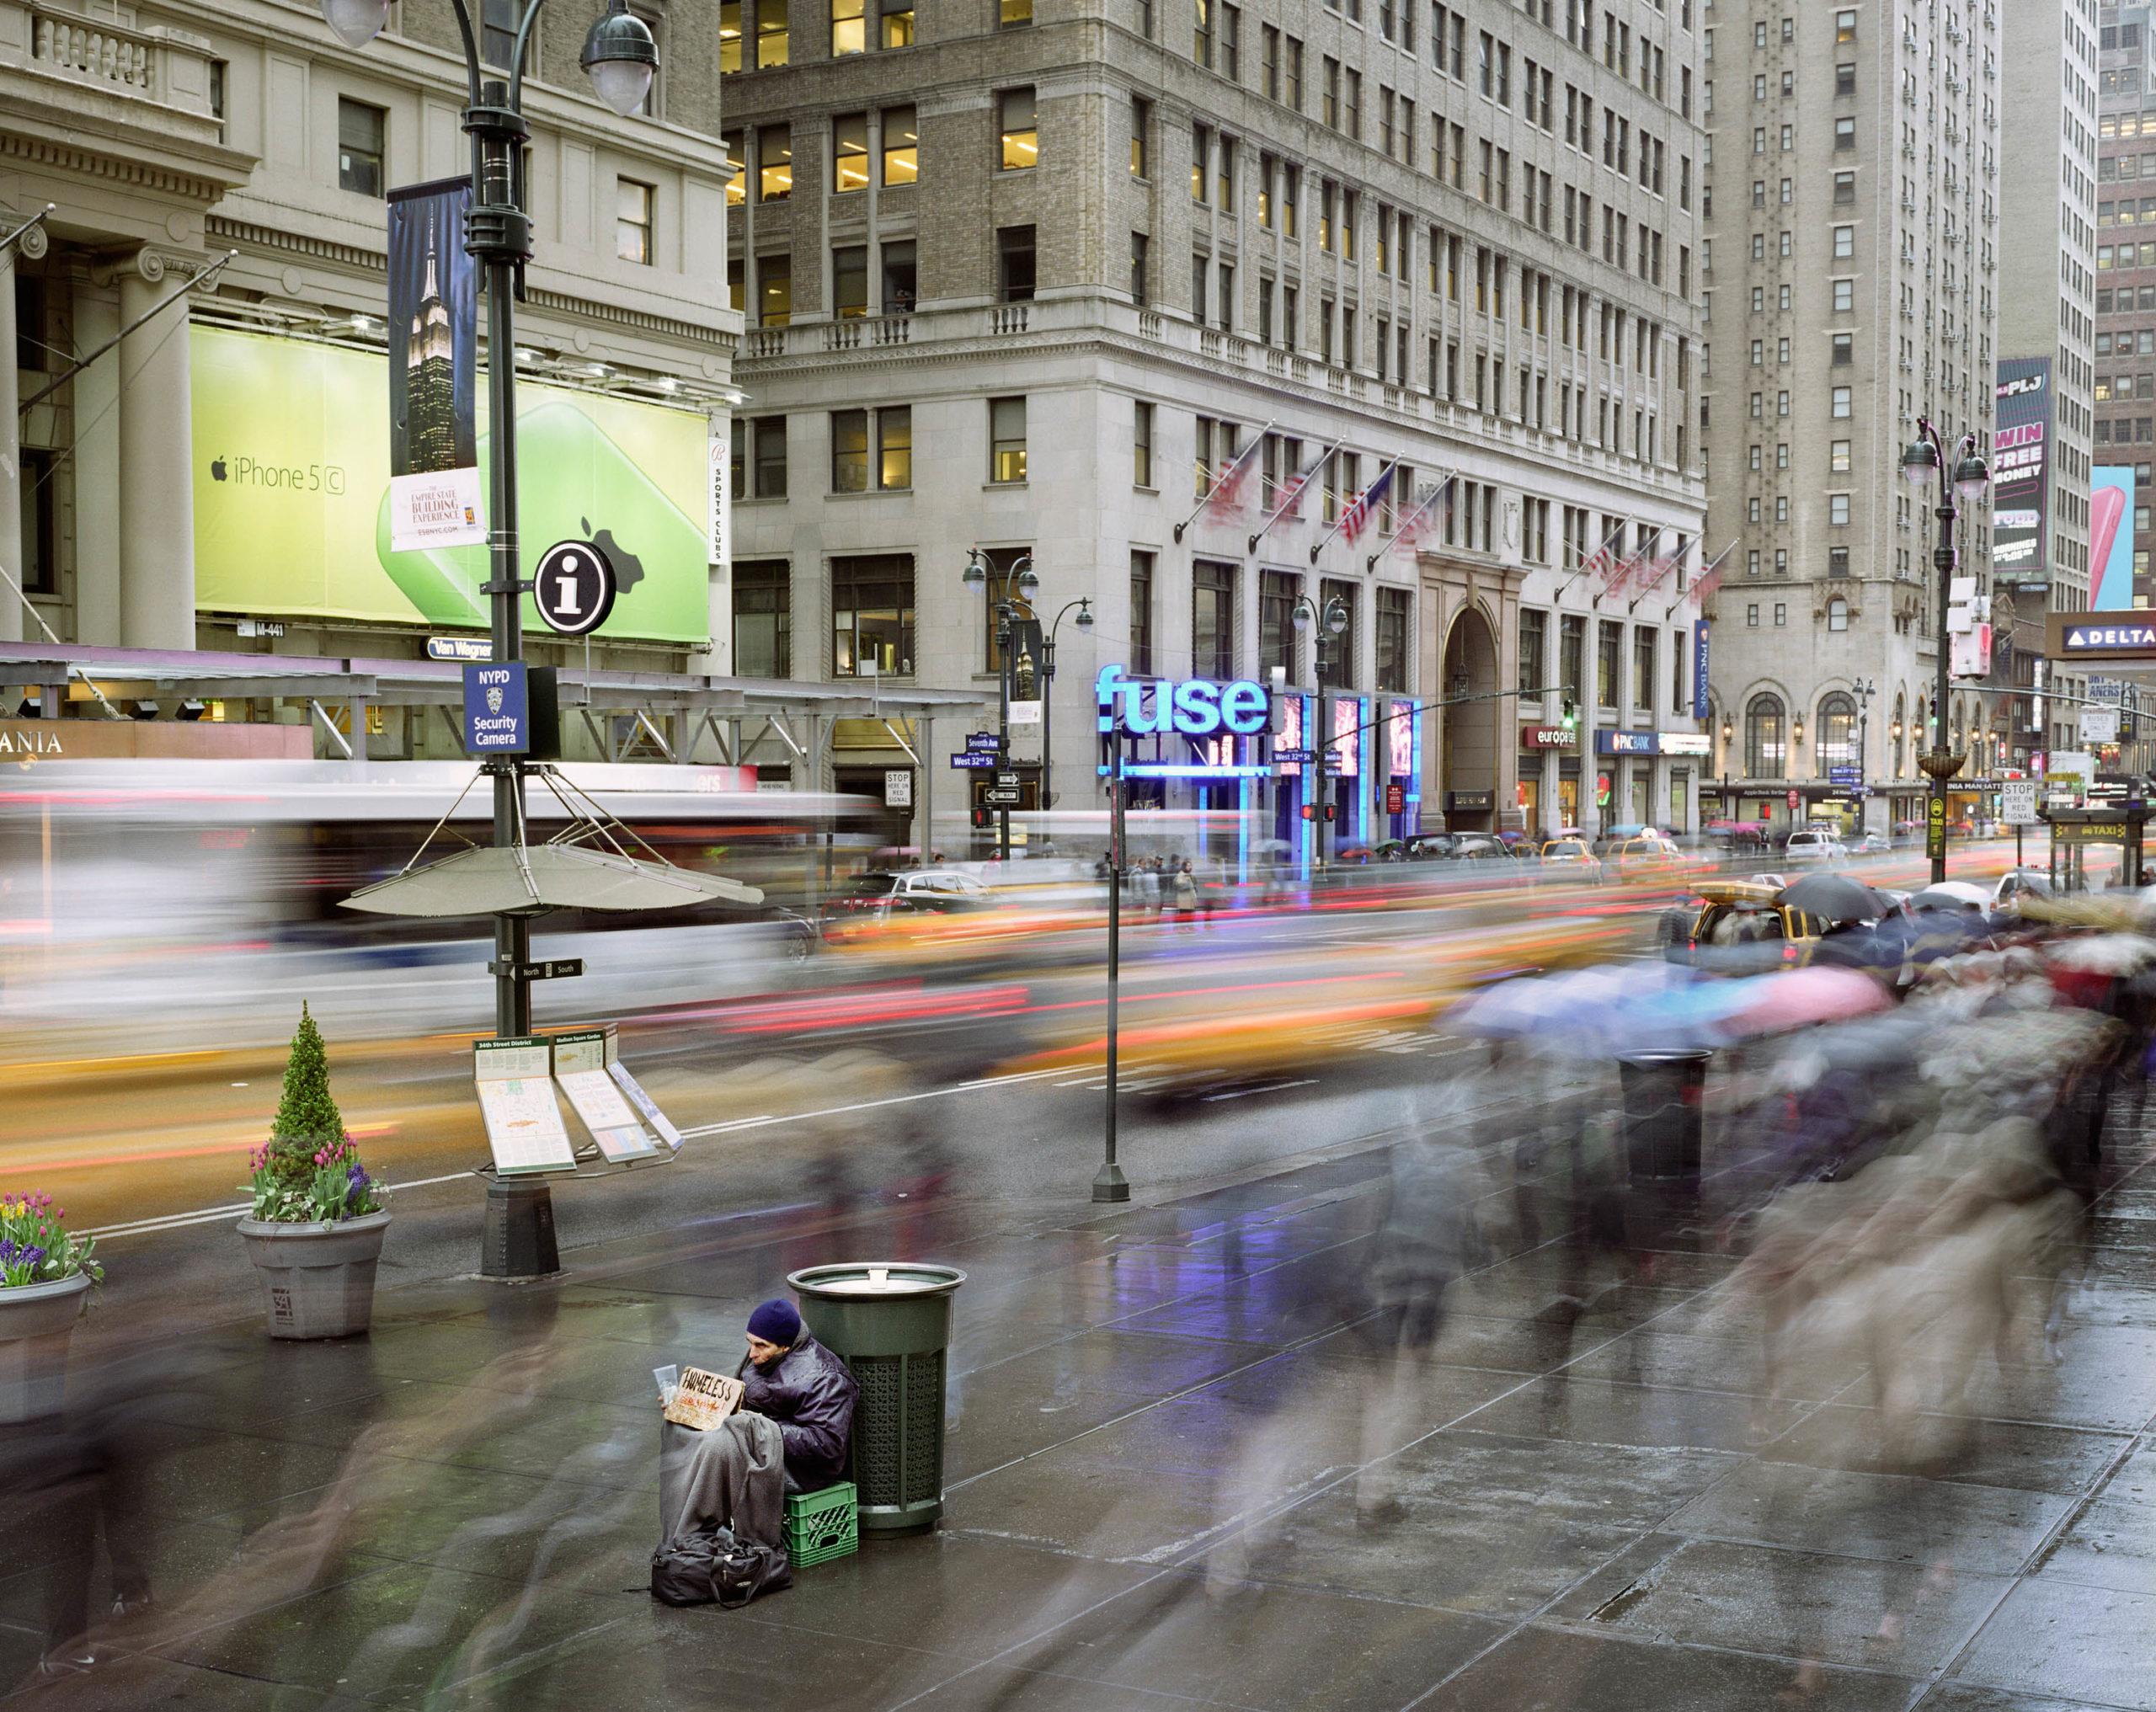 7th Avenue, Manhattan, New York, USA